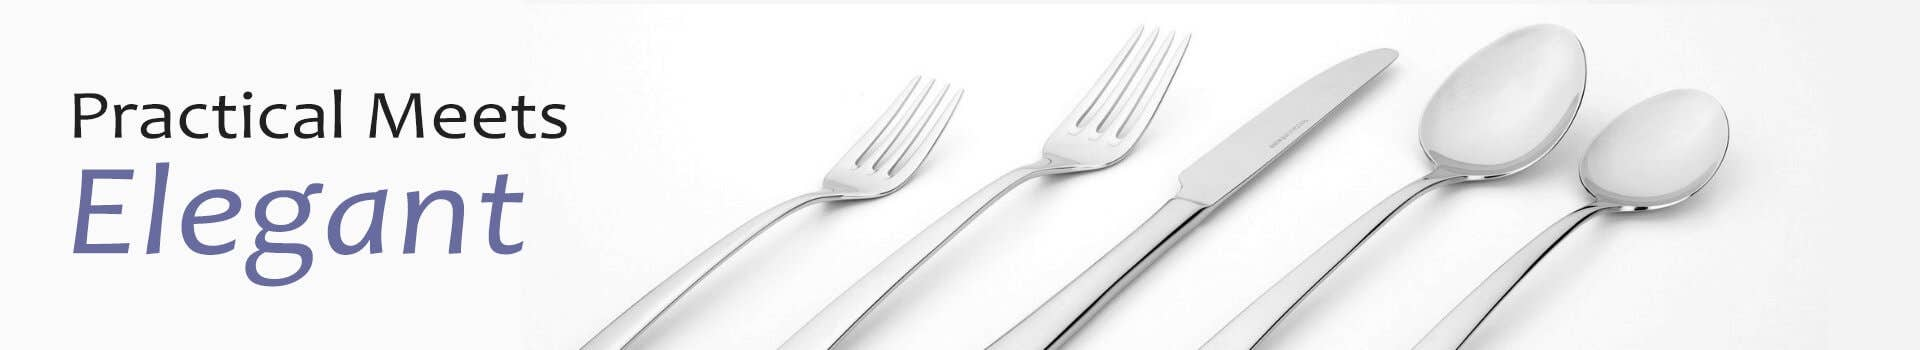 Hourglass Chopstick Rests